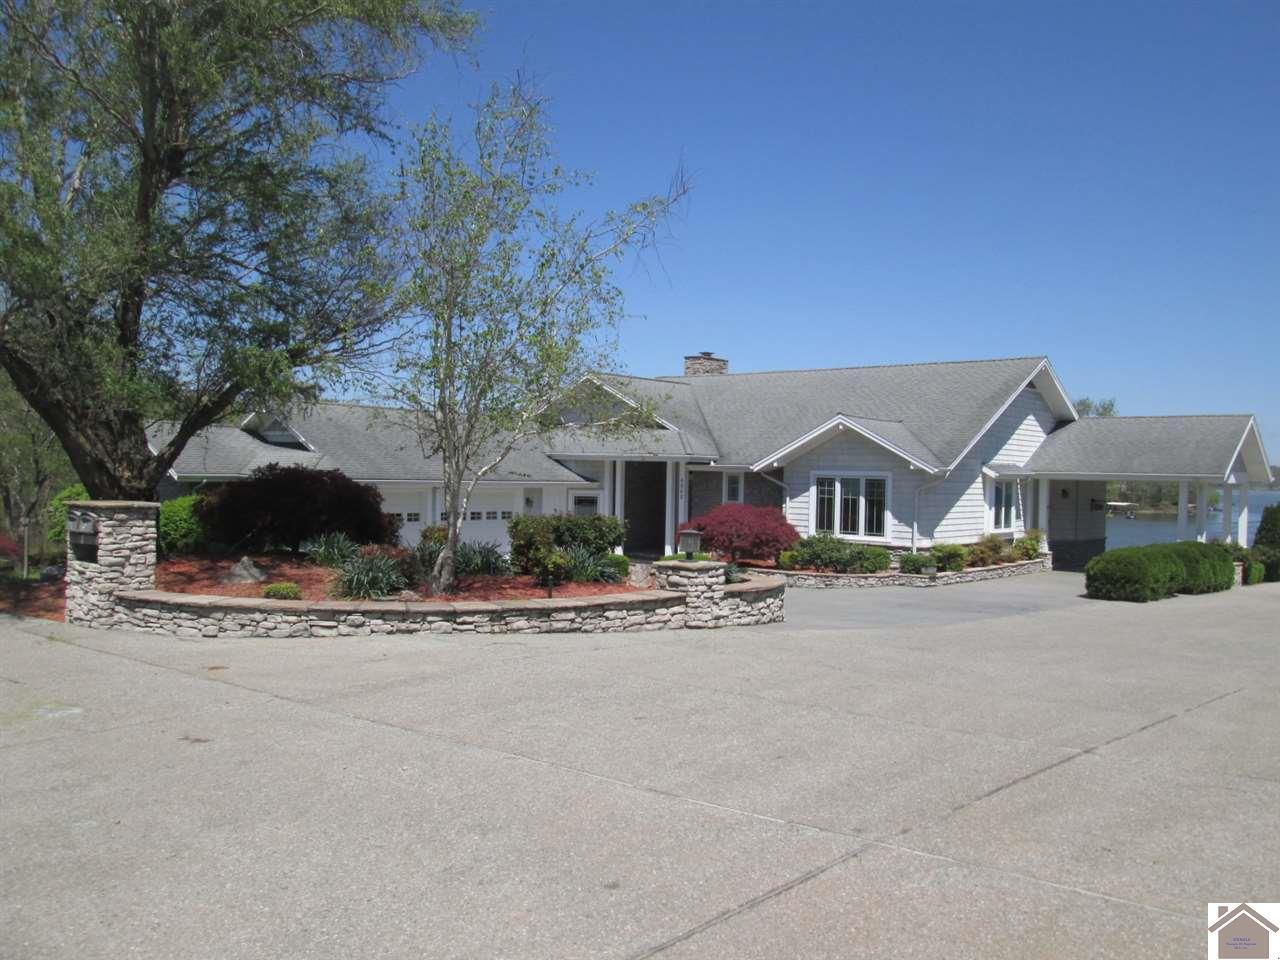 4568 Blue Springs Road Cadiz, KY 42211